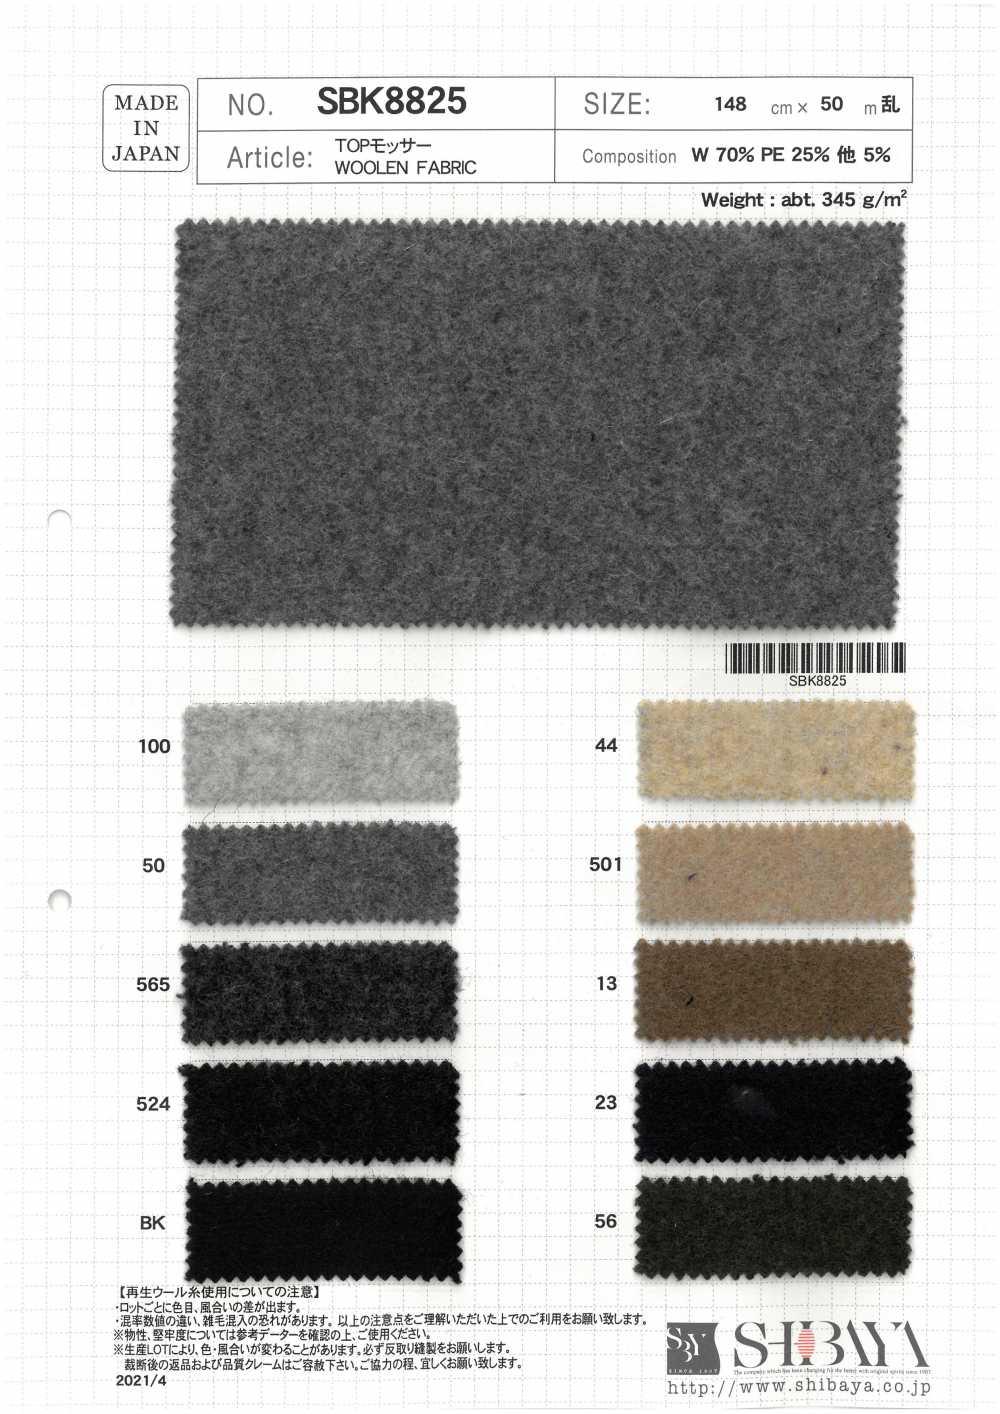 SBK8825 TOP モッサー[生地] 柴屋/オークラ商事 - ApparelX アパレル資材卸通販